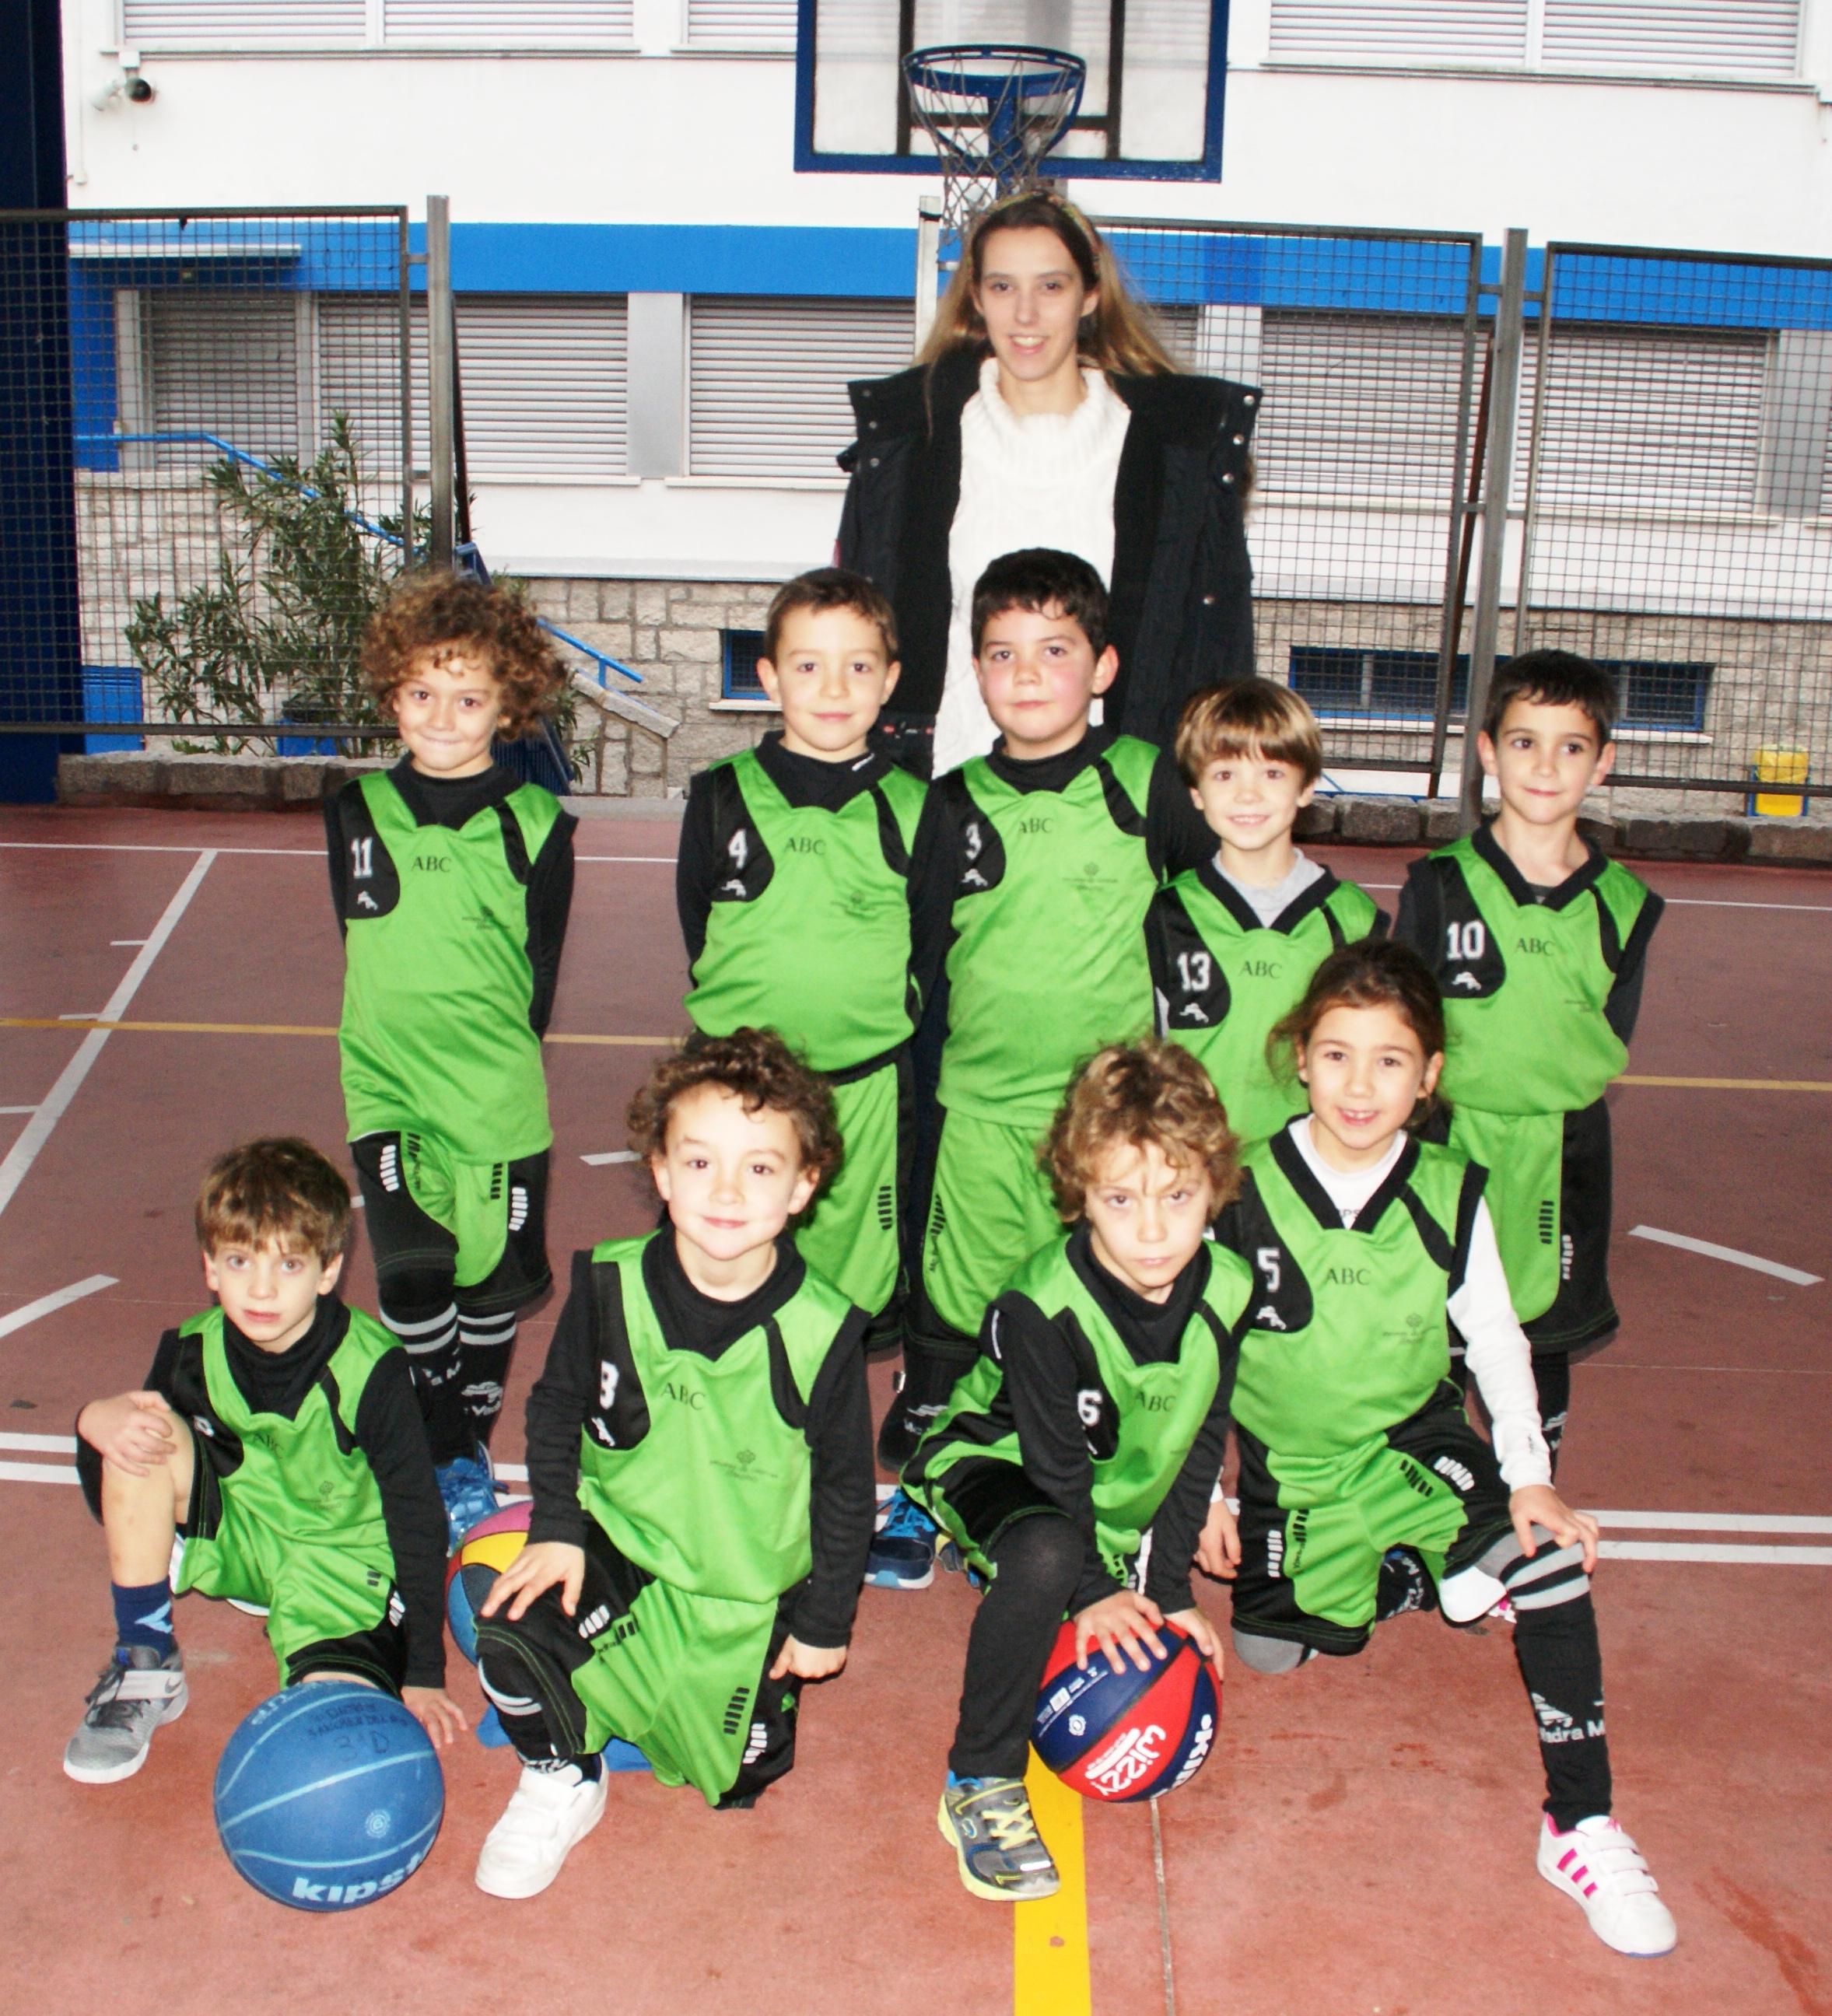 Miramadrid y Vedruna Inter FS B se alzan con la victoria | ABCNClase